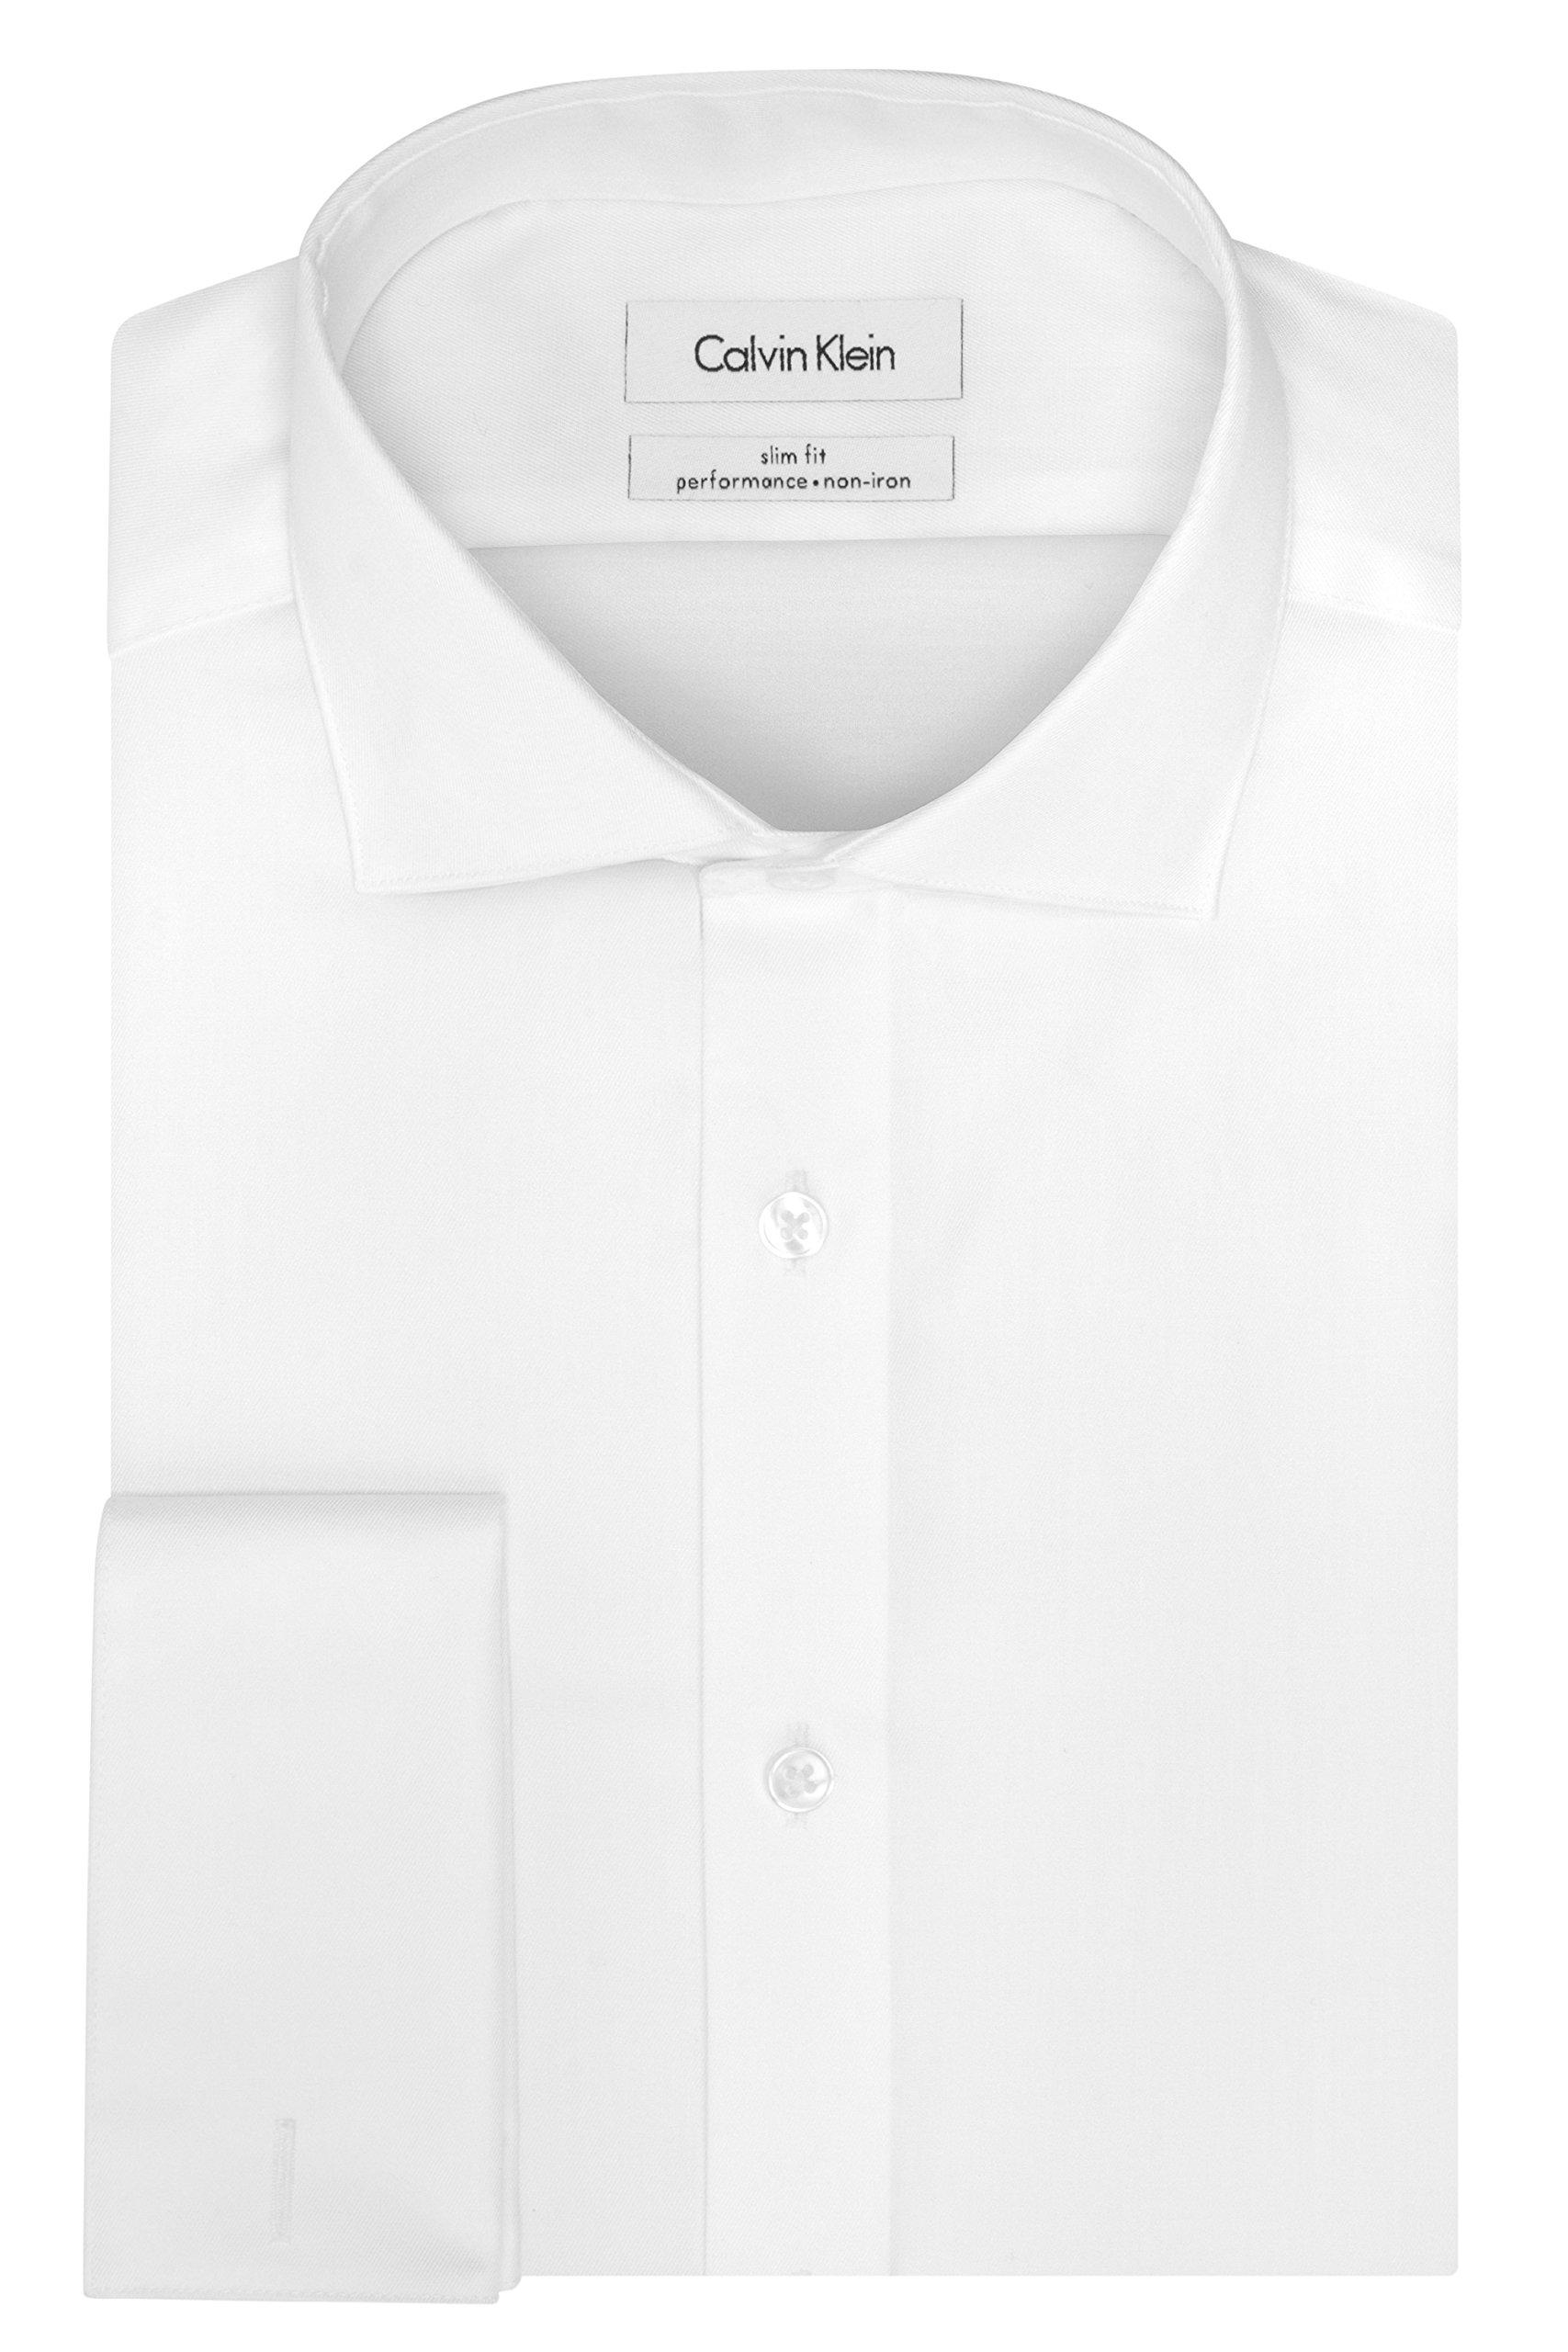 Calvin Klein Men's Non Iron Slim Fit French Cuff Dress Shirt, White, 15'' Neck 32''-33'' Sleeve